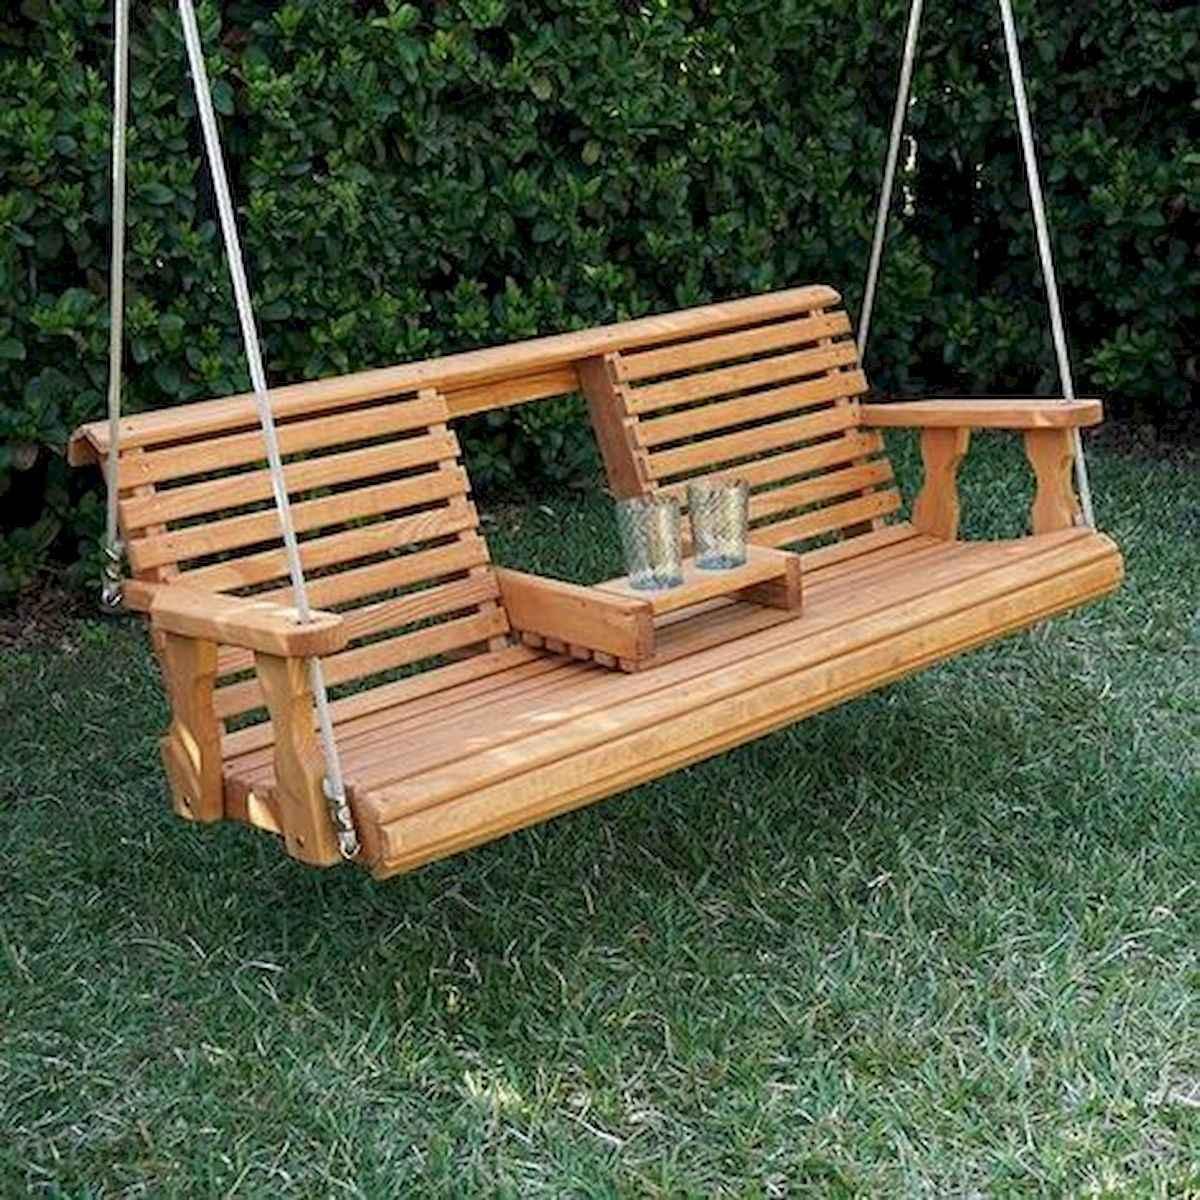 60 Amazing DIY Projects Otdoors Furniture Design Ideas (27)